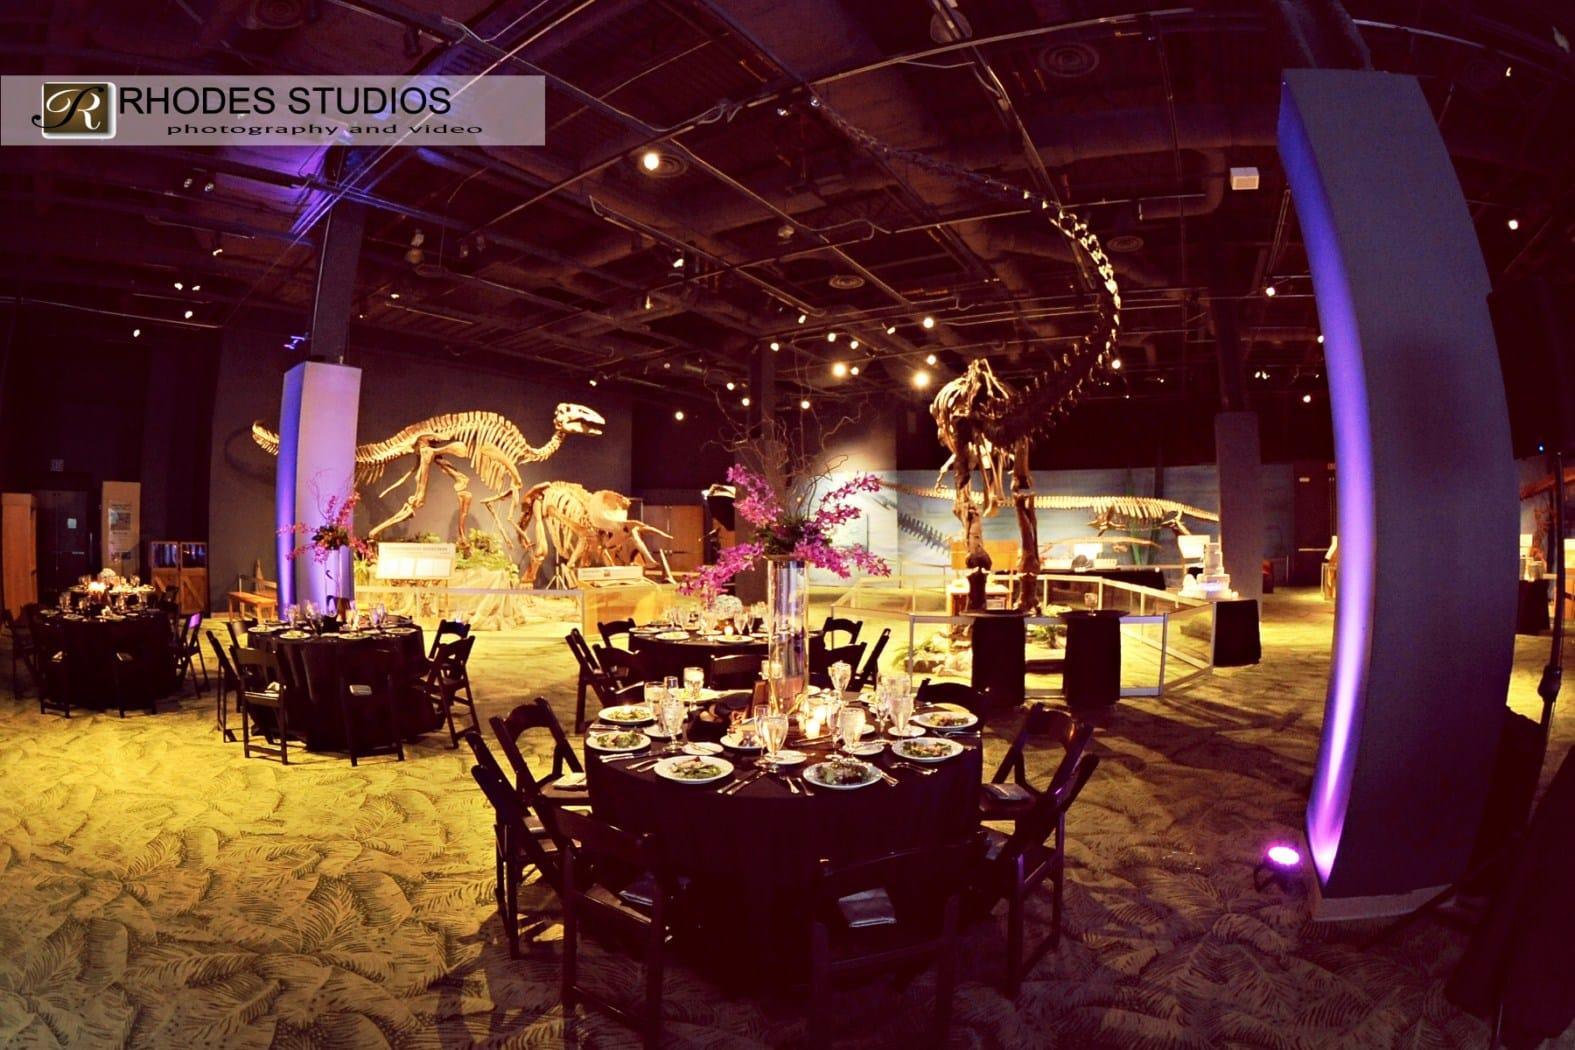 Orlando Wedding Dj Our Rocks Science Center Rhodes Studios